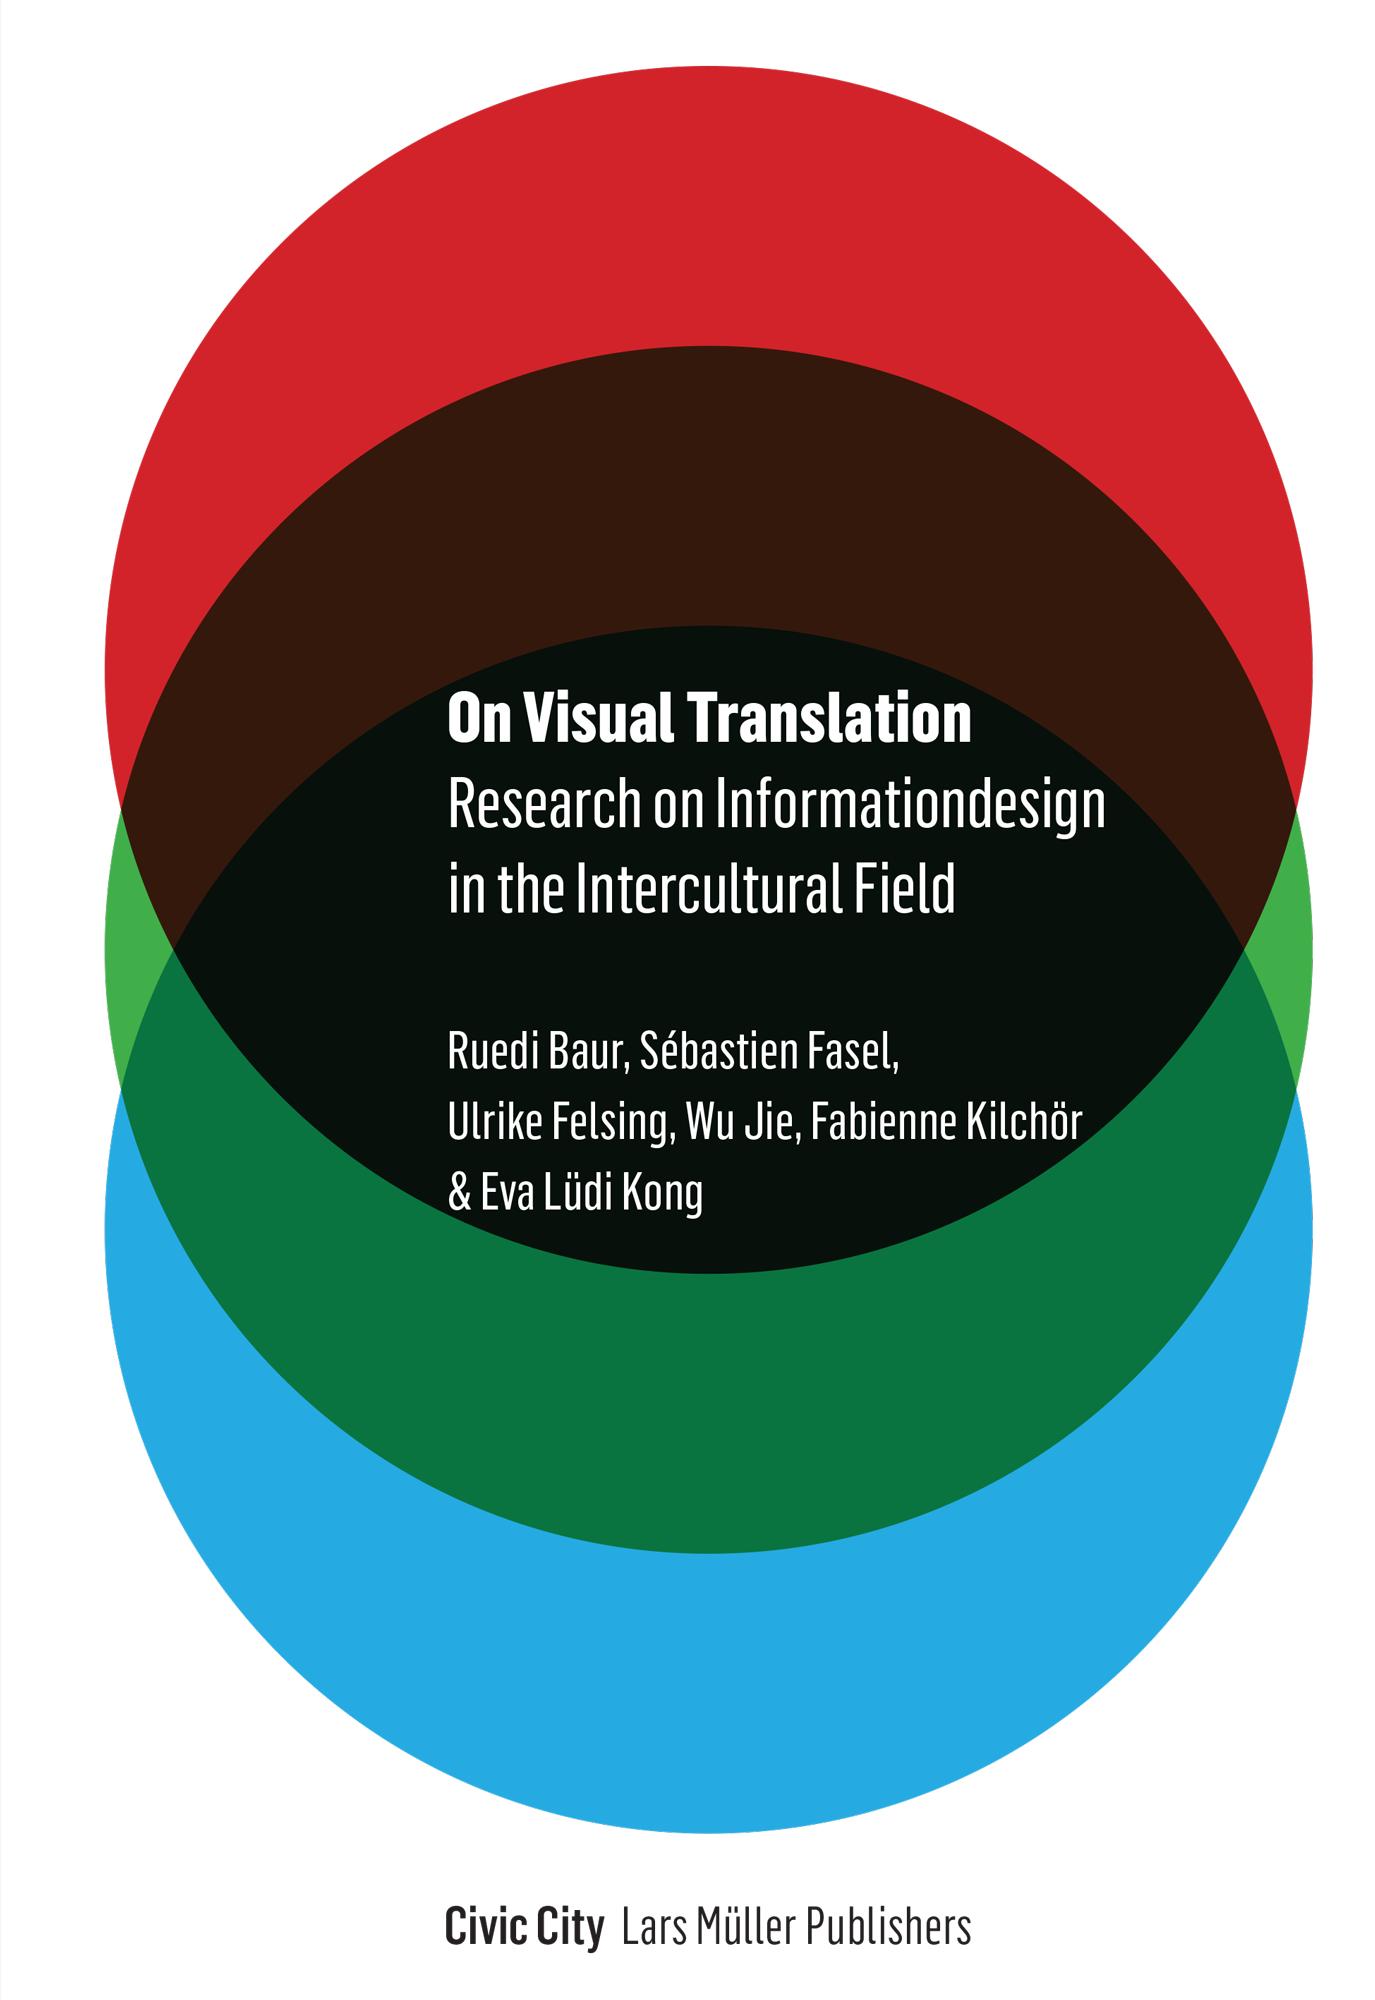 Part_3_Informationdesign_Intercultural_Field_Felsing-Titel